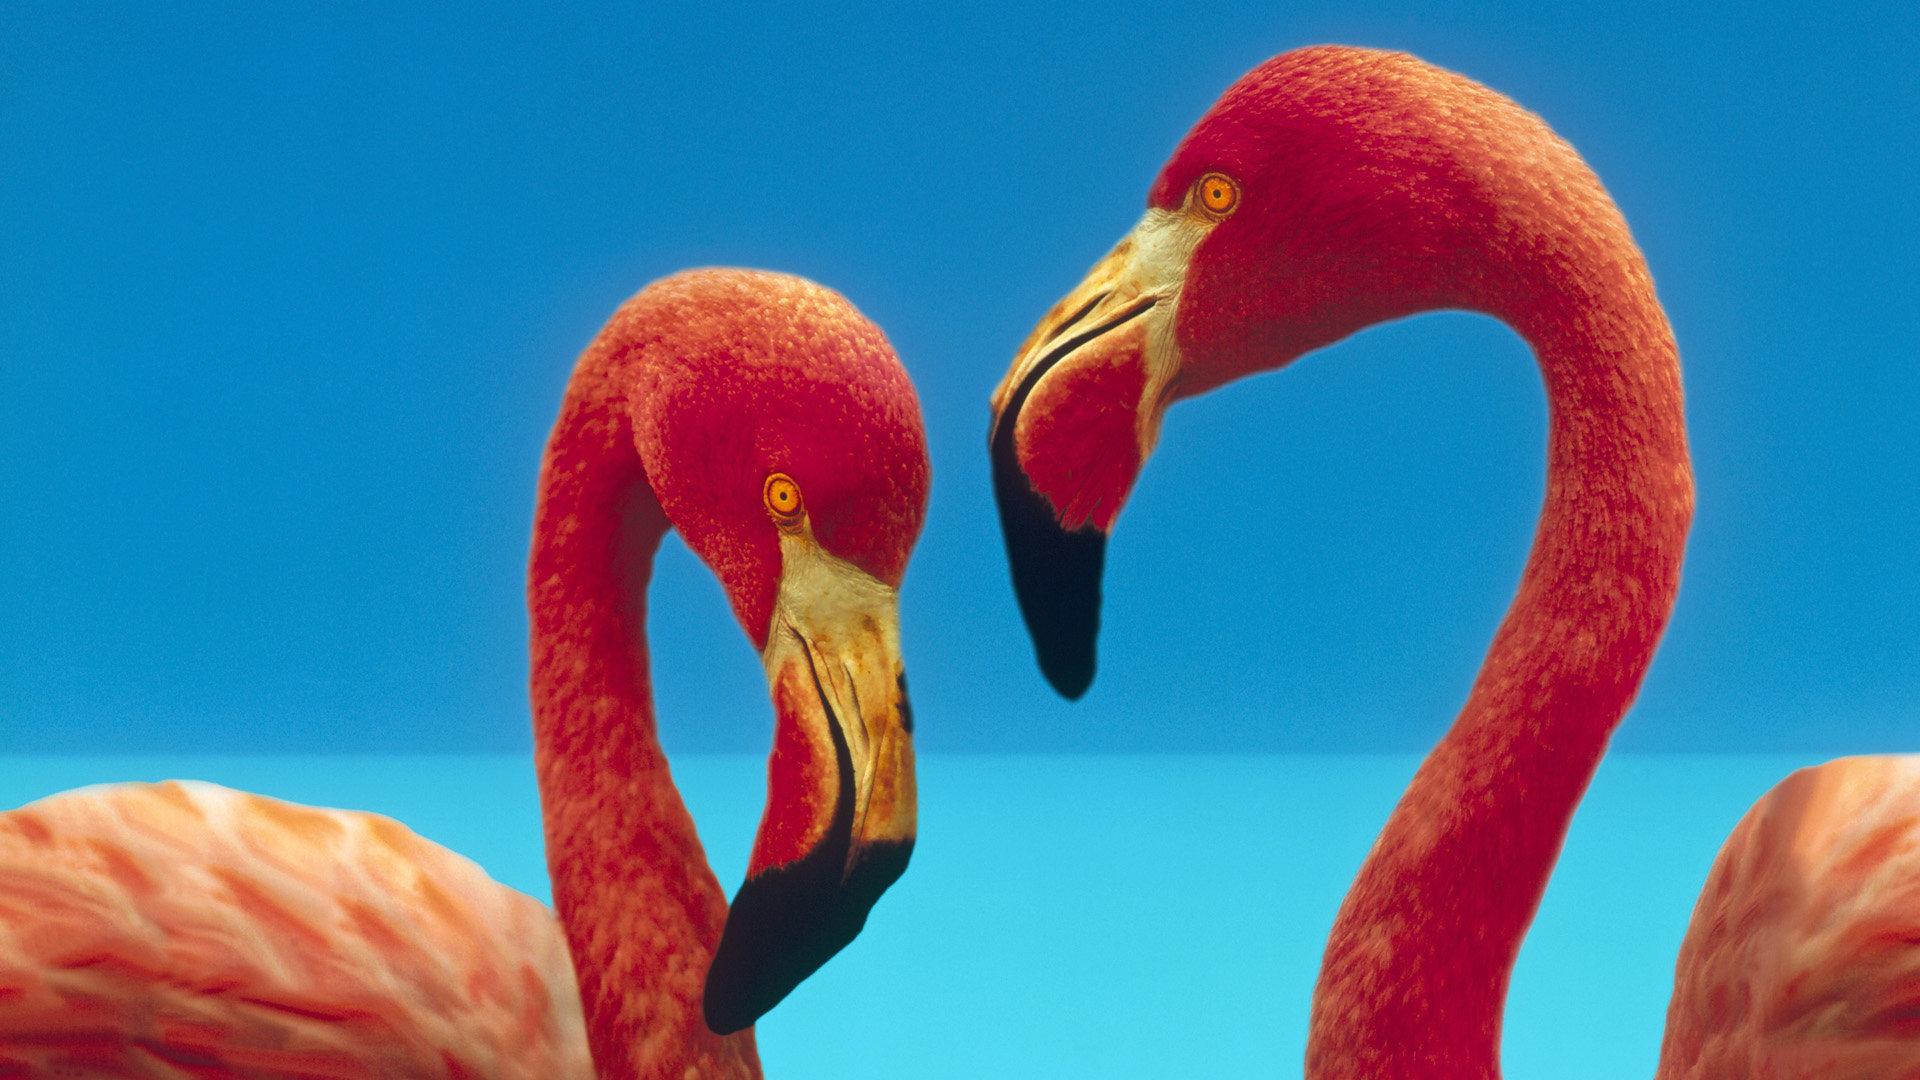 Download Hd 1080p Flamingo Desktop Wallpaper Id 66717 For Free